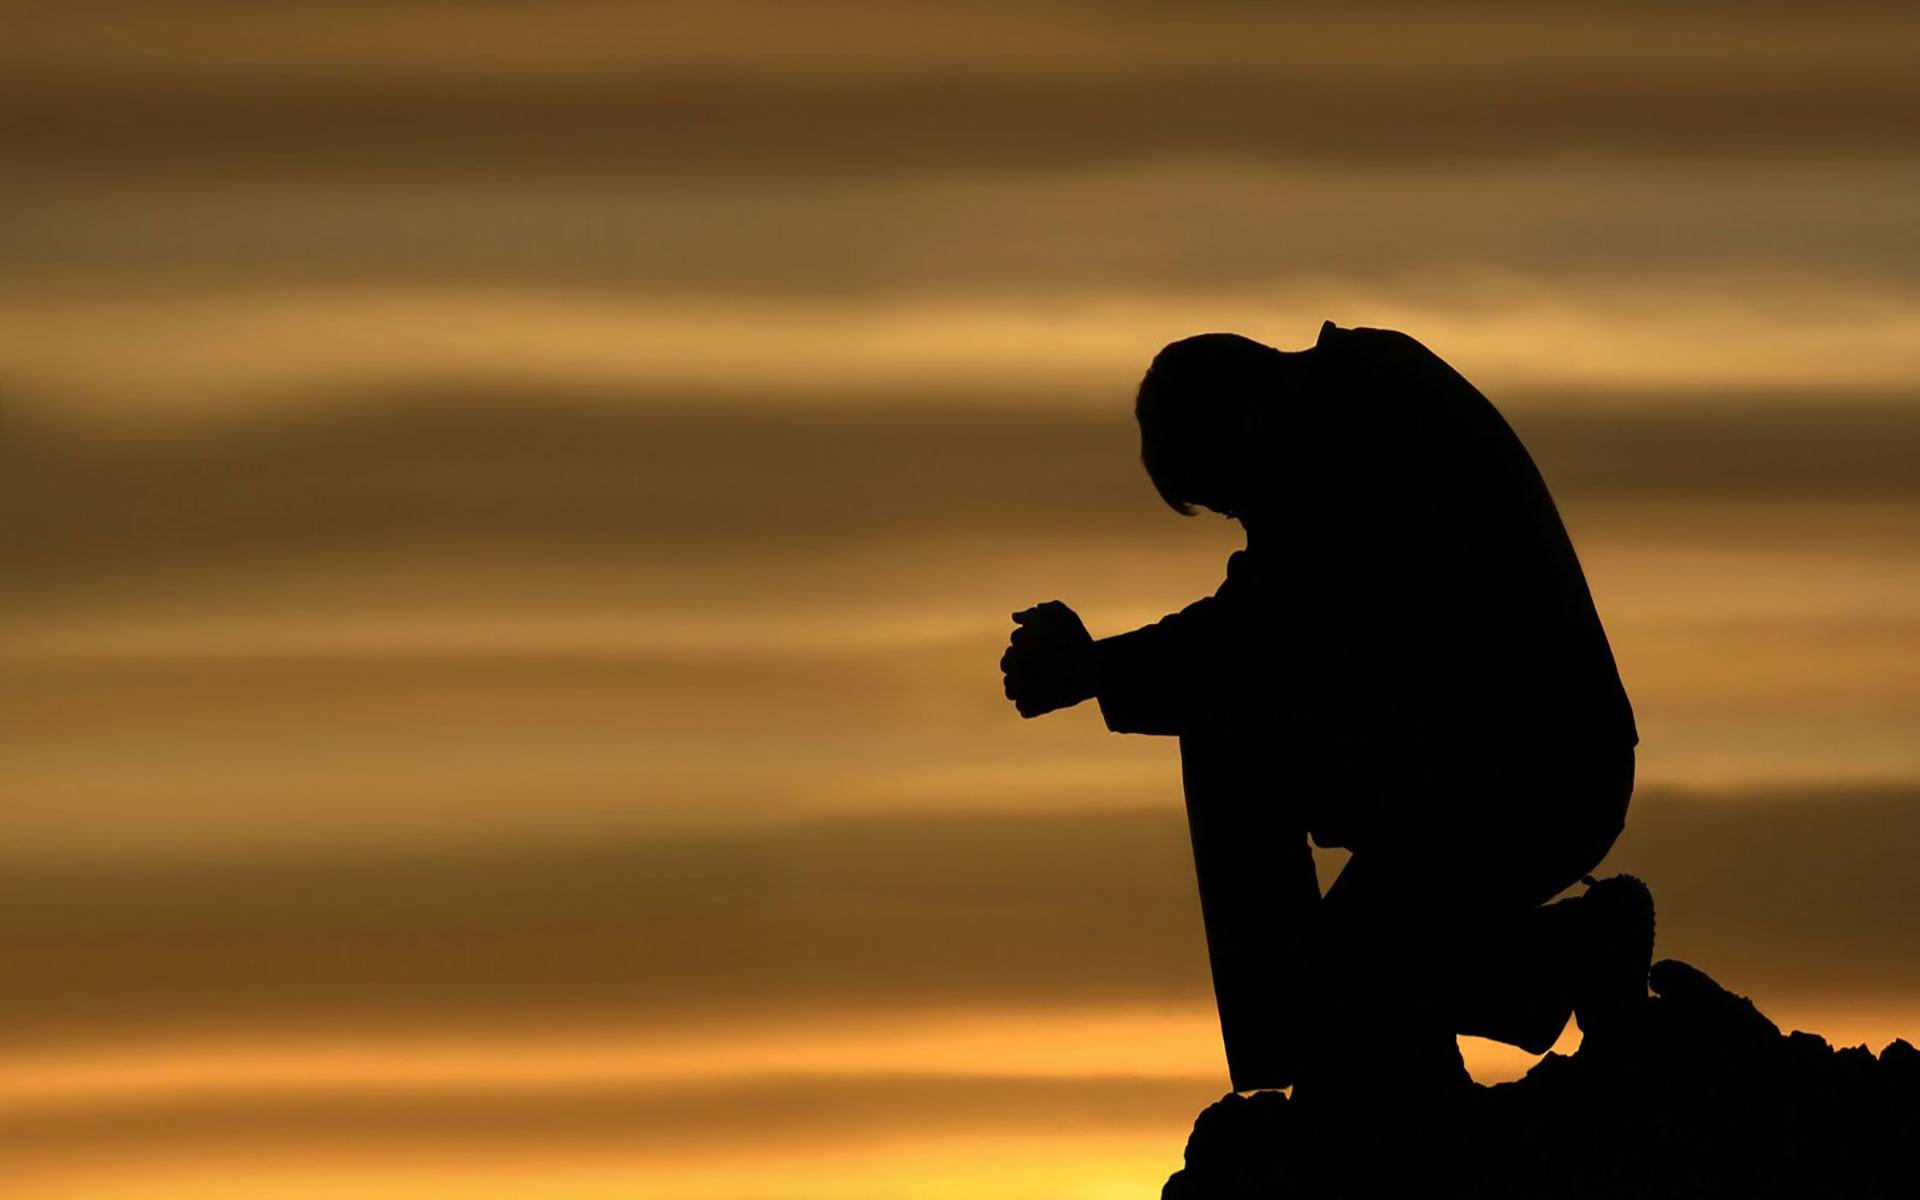 1920x1200 alone boy in love facebook profile heart touching sad boy wallpaper alone boy sad